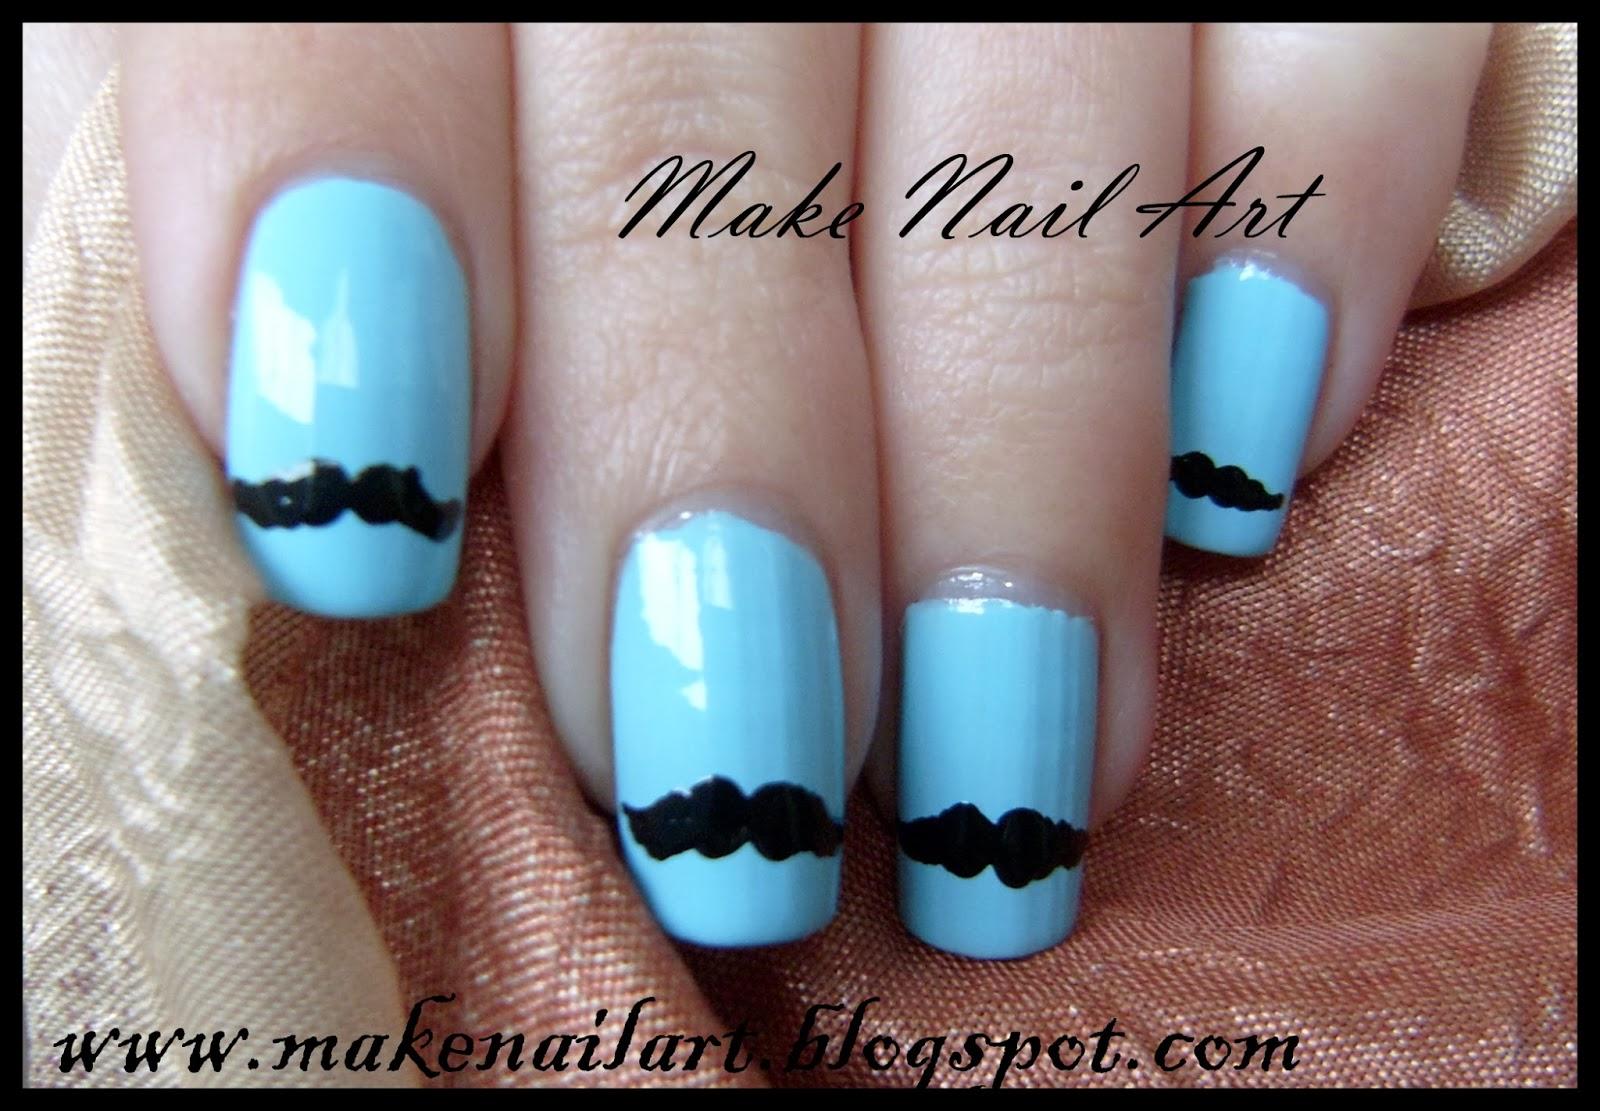 Make nail art november 2013 moustache nail art prinsesfo Choice Image